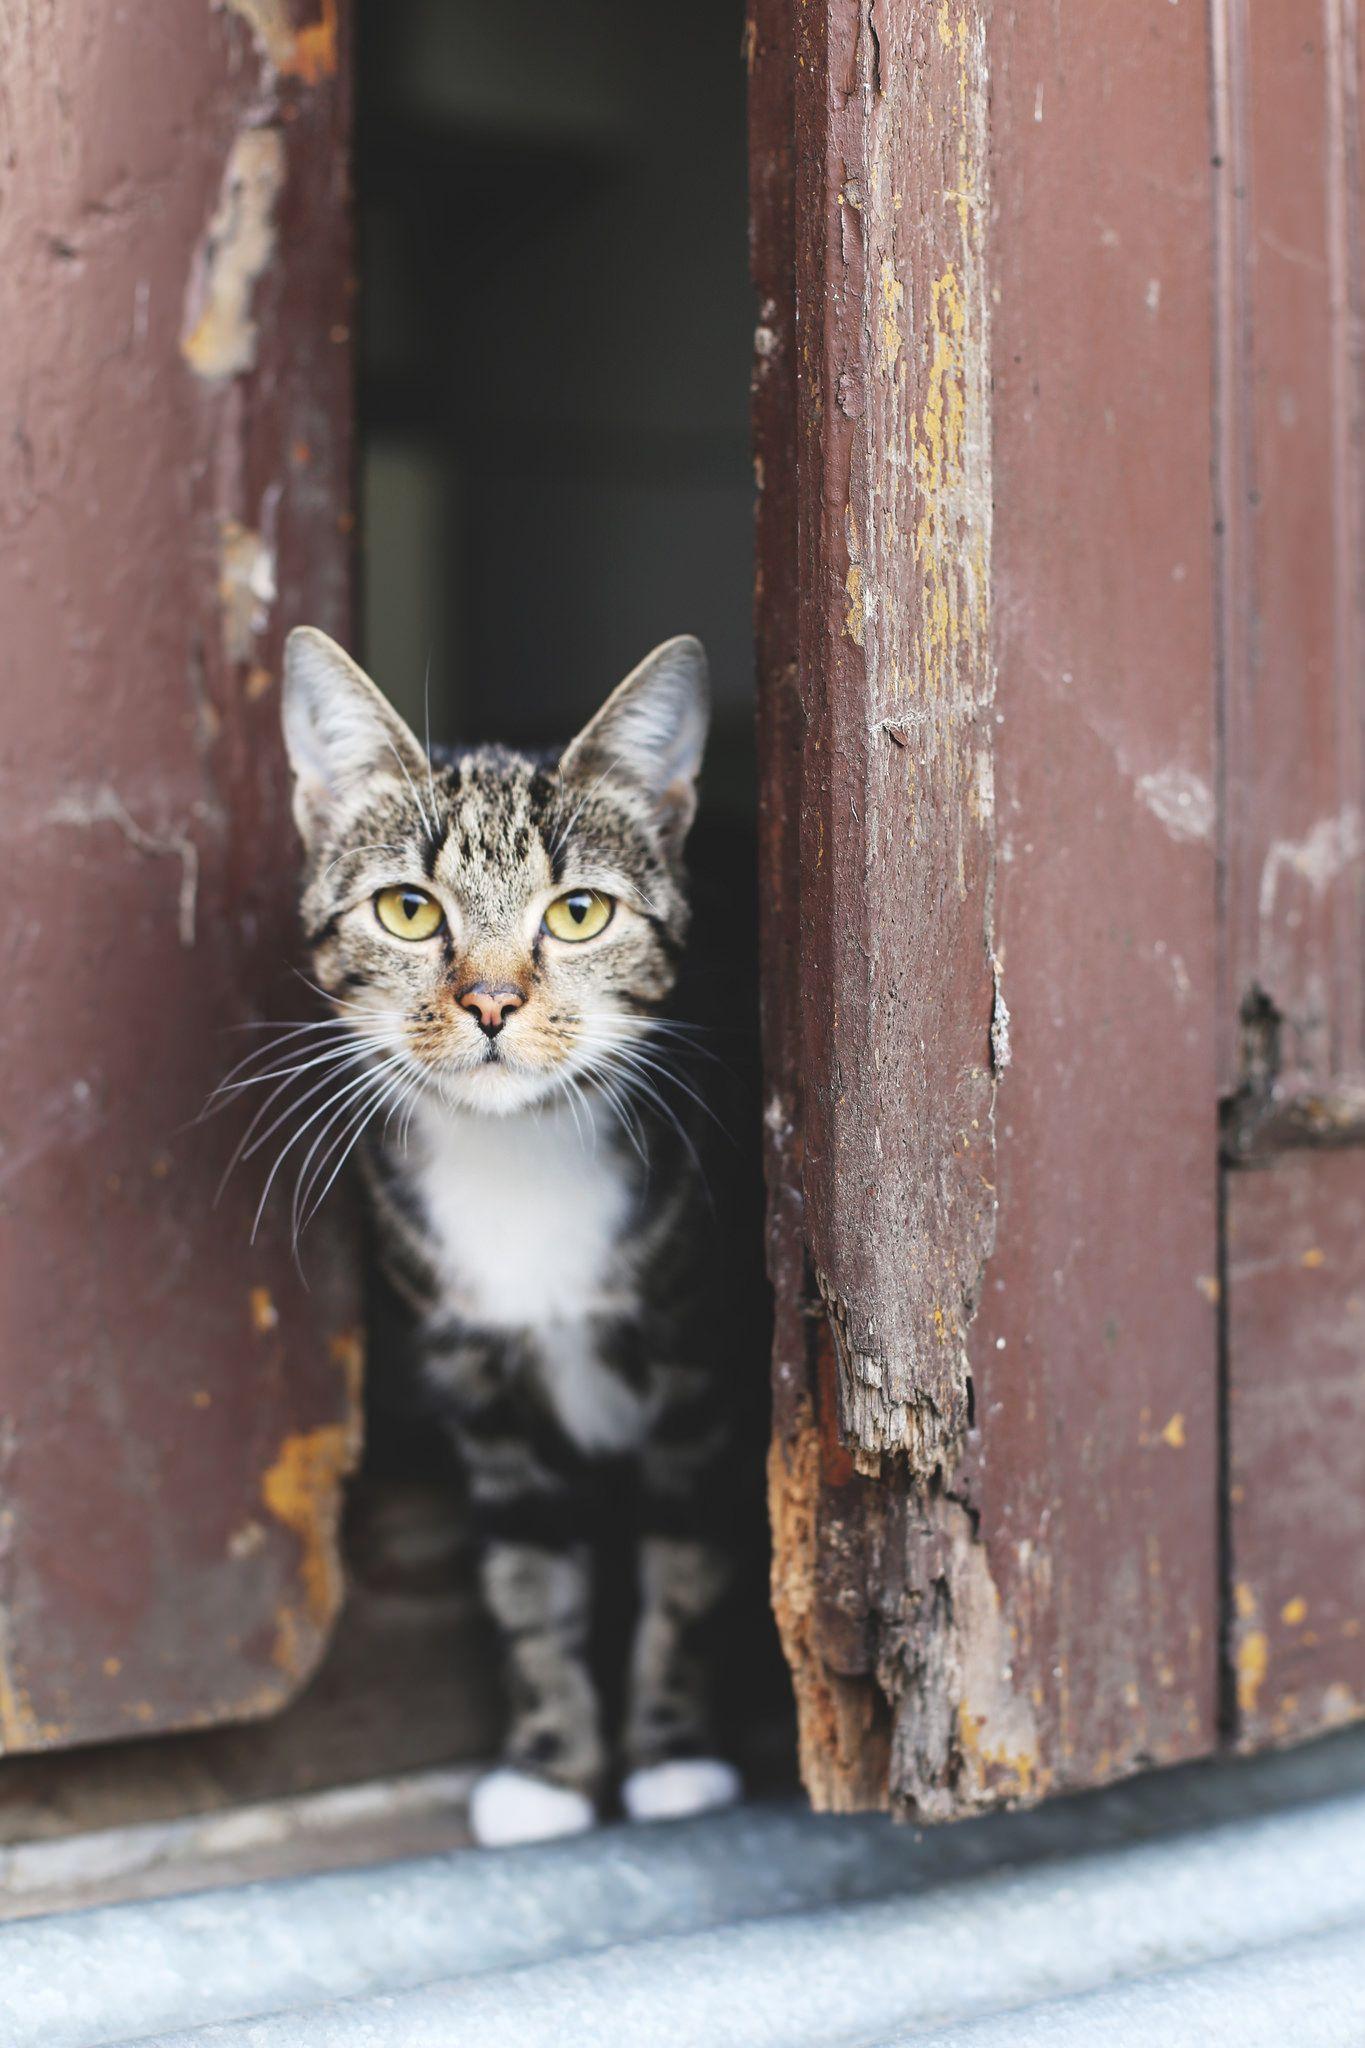 Ryszarda Ryśka Cats, Cool cats, Man, dog